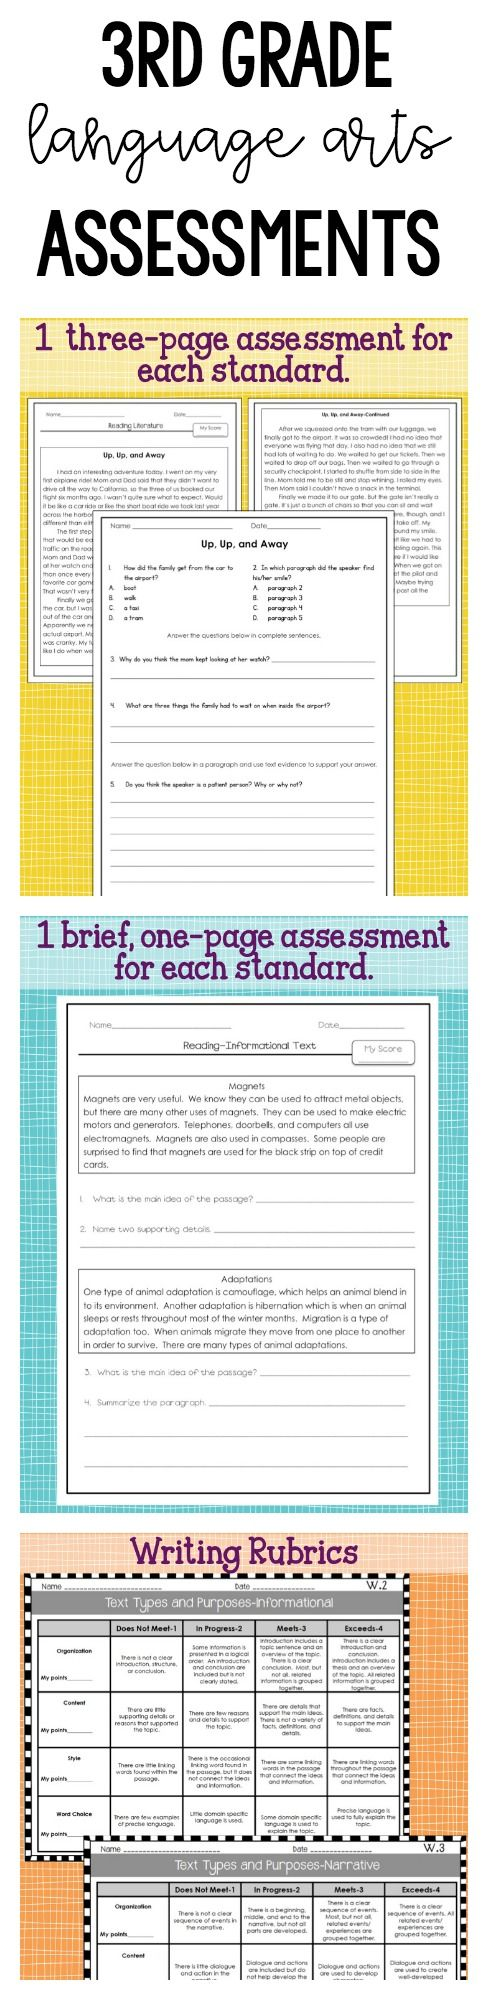 Third Grade Language Arts Assessments Common Core  Not Common